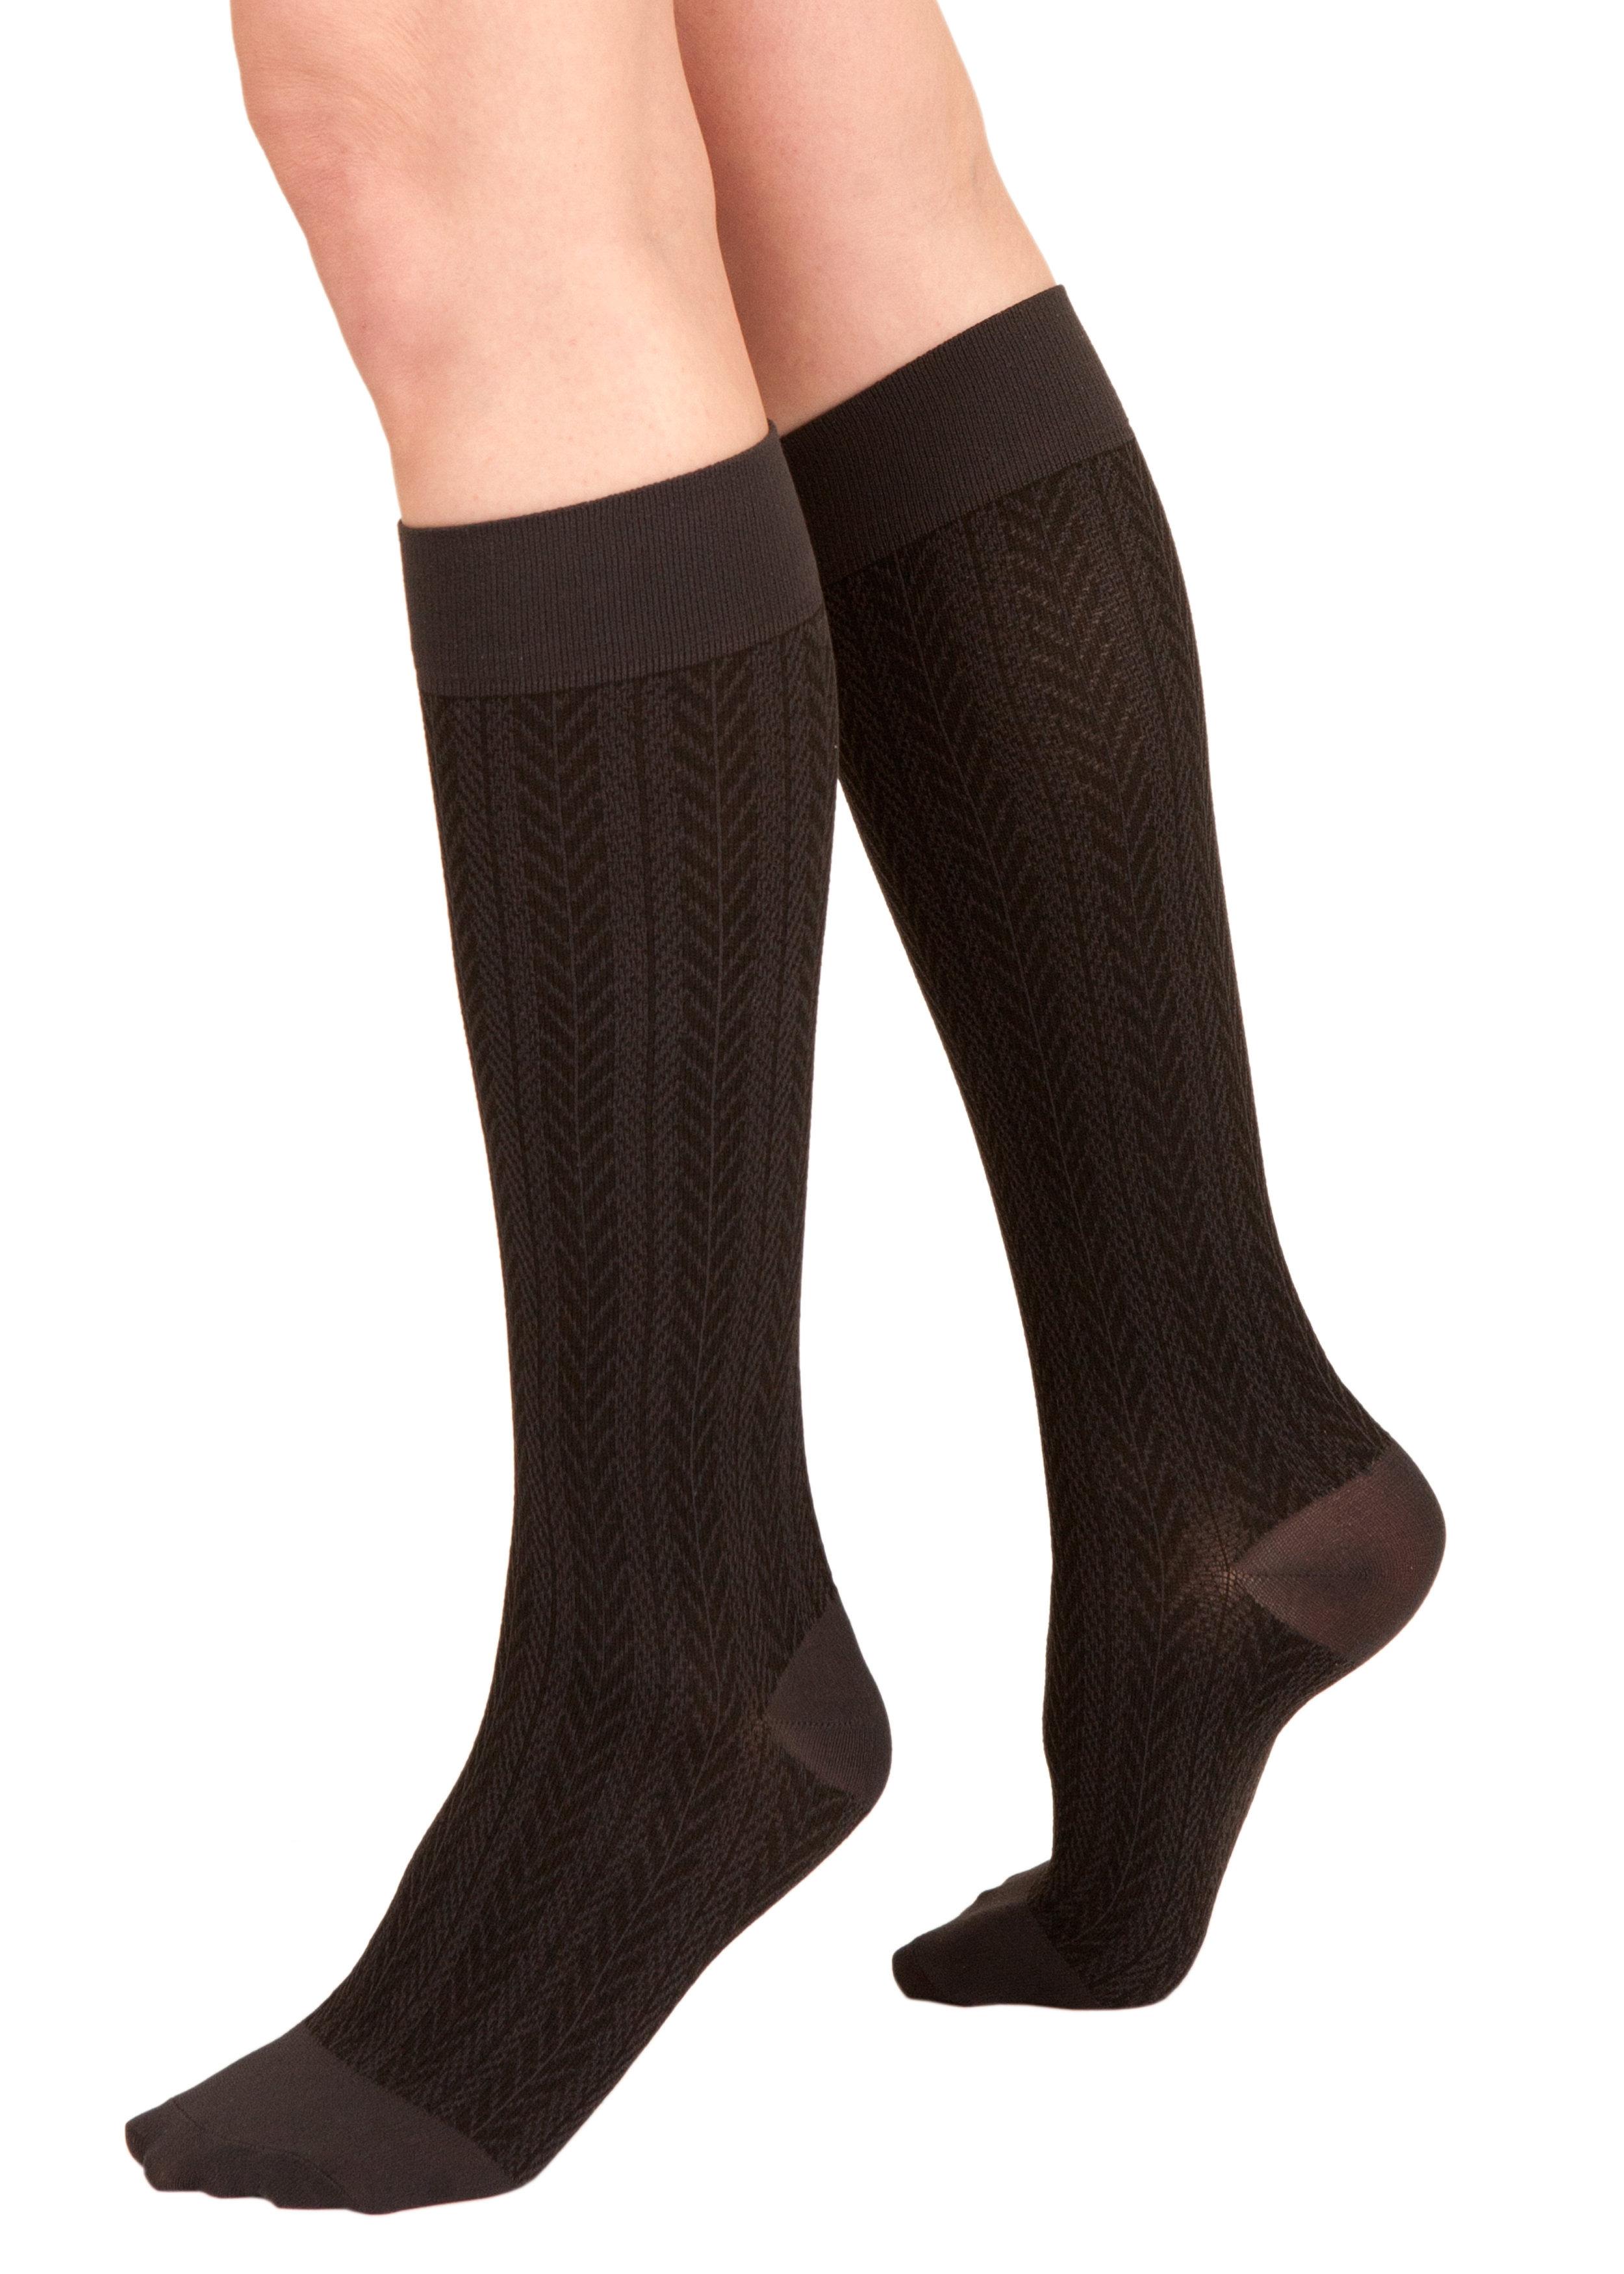 8f597eb45 Silkies Compression Herringbone Trouser Socks (15-20 mmHg)